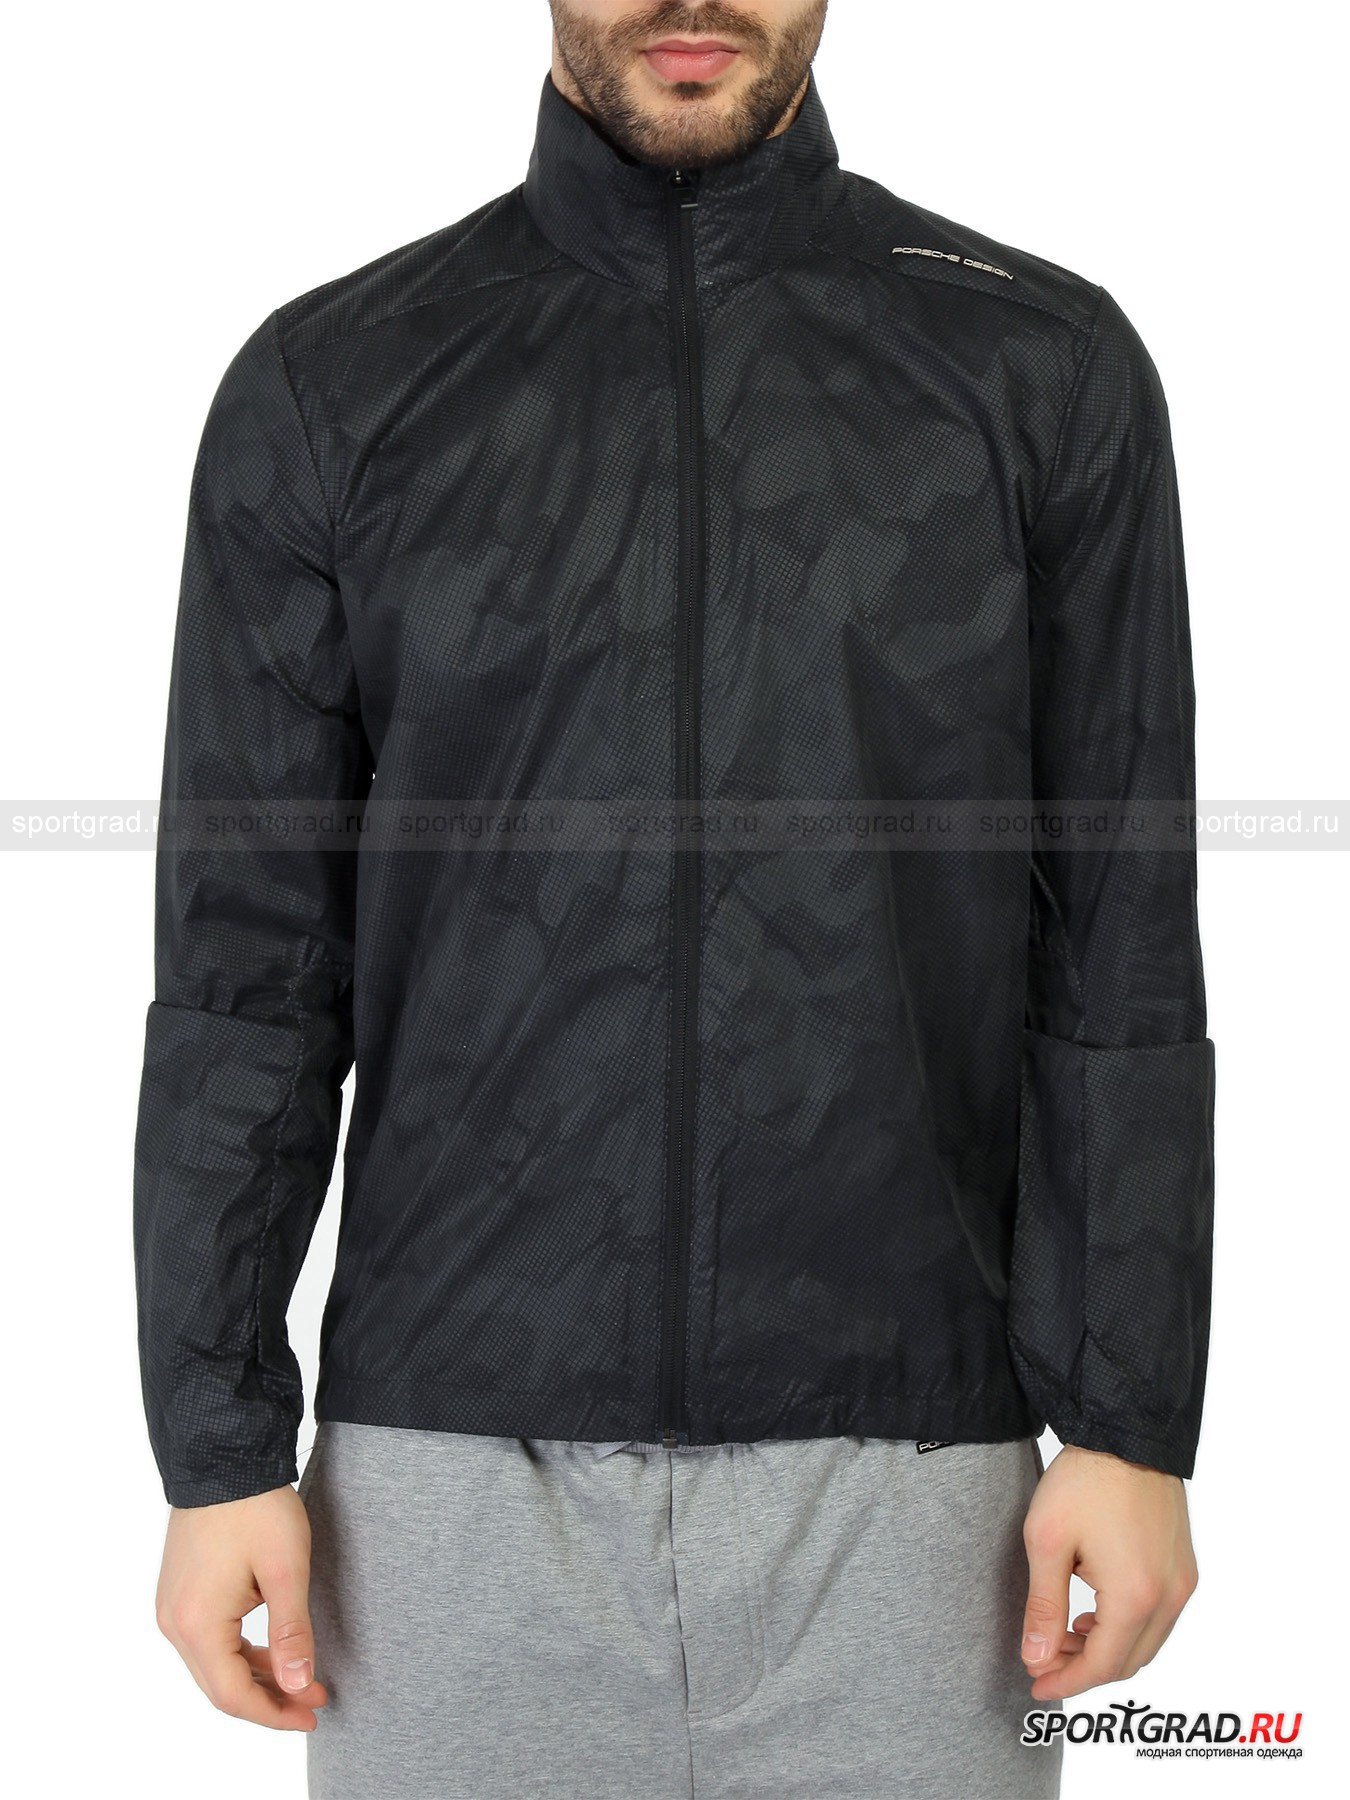 ������ ������� ��� ���� Hi-Reflective Jacket PORSCHE DESIGN